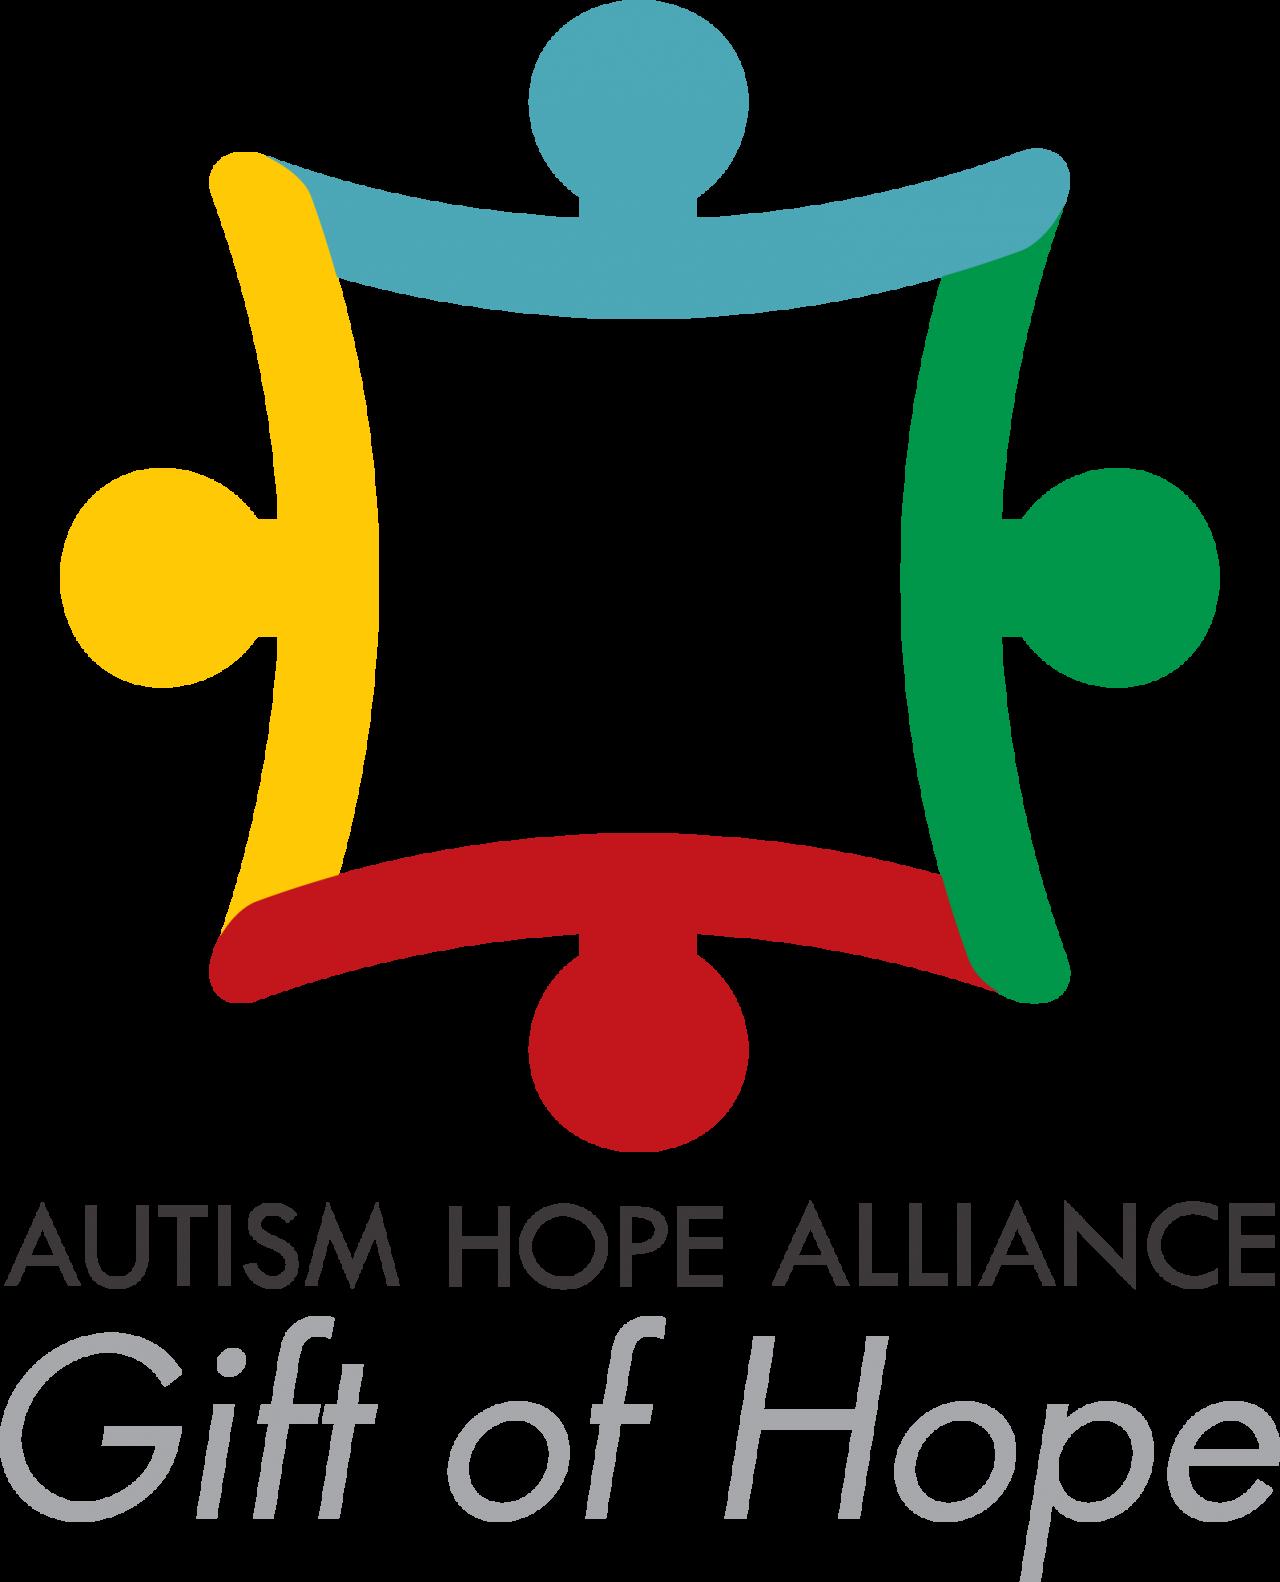 Asset 1 Autism Hope Alliance